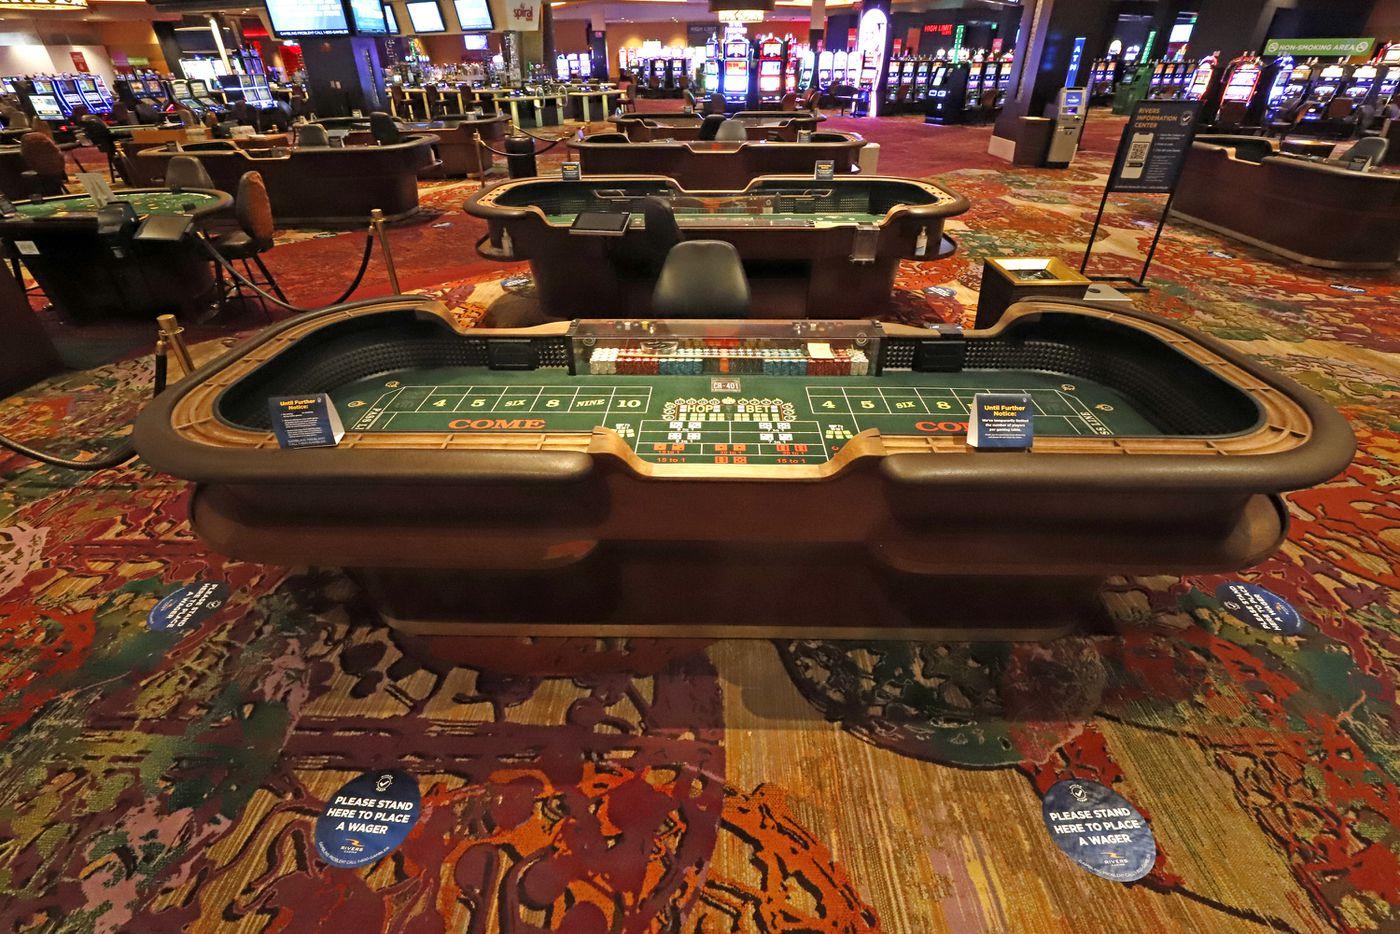 Rivers casino poker room phone number 24-7